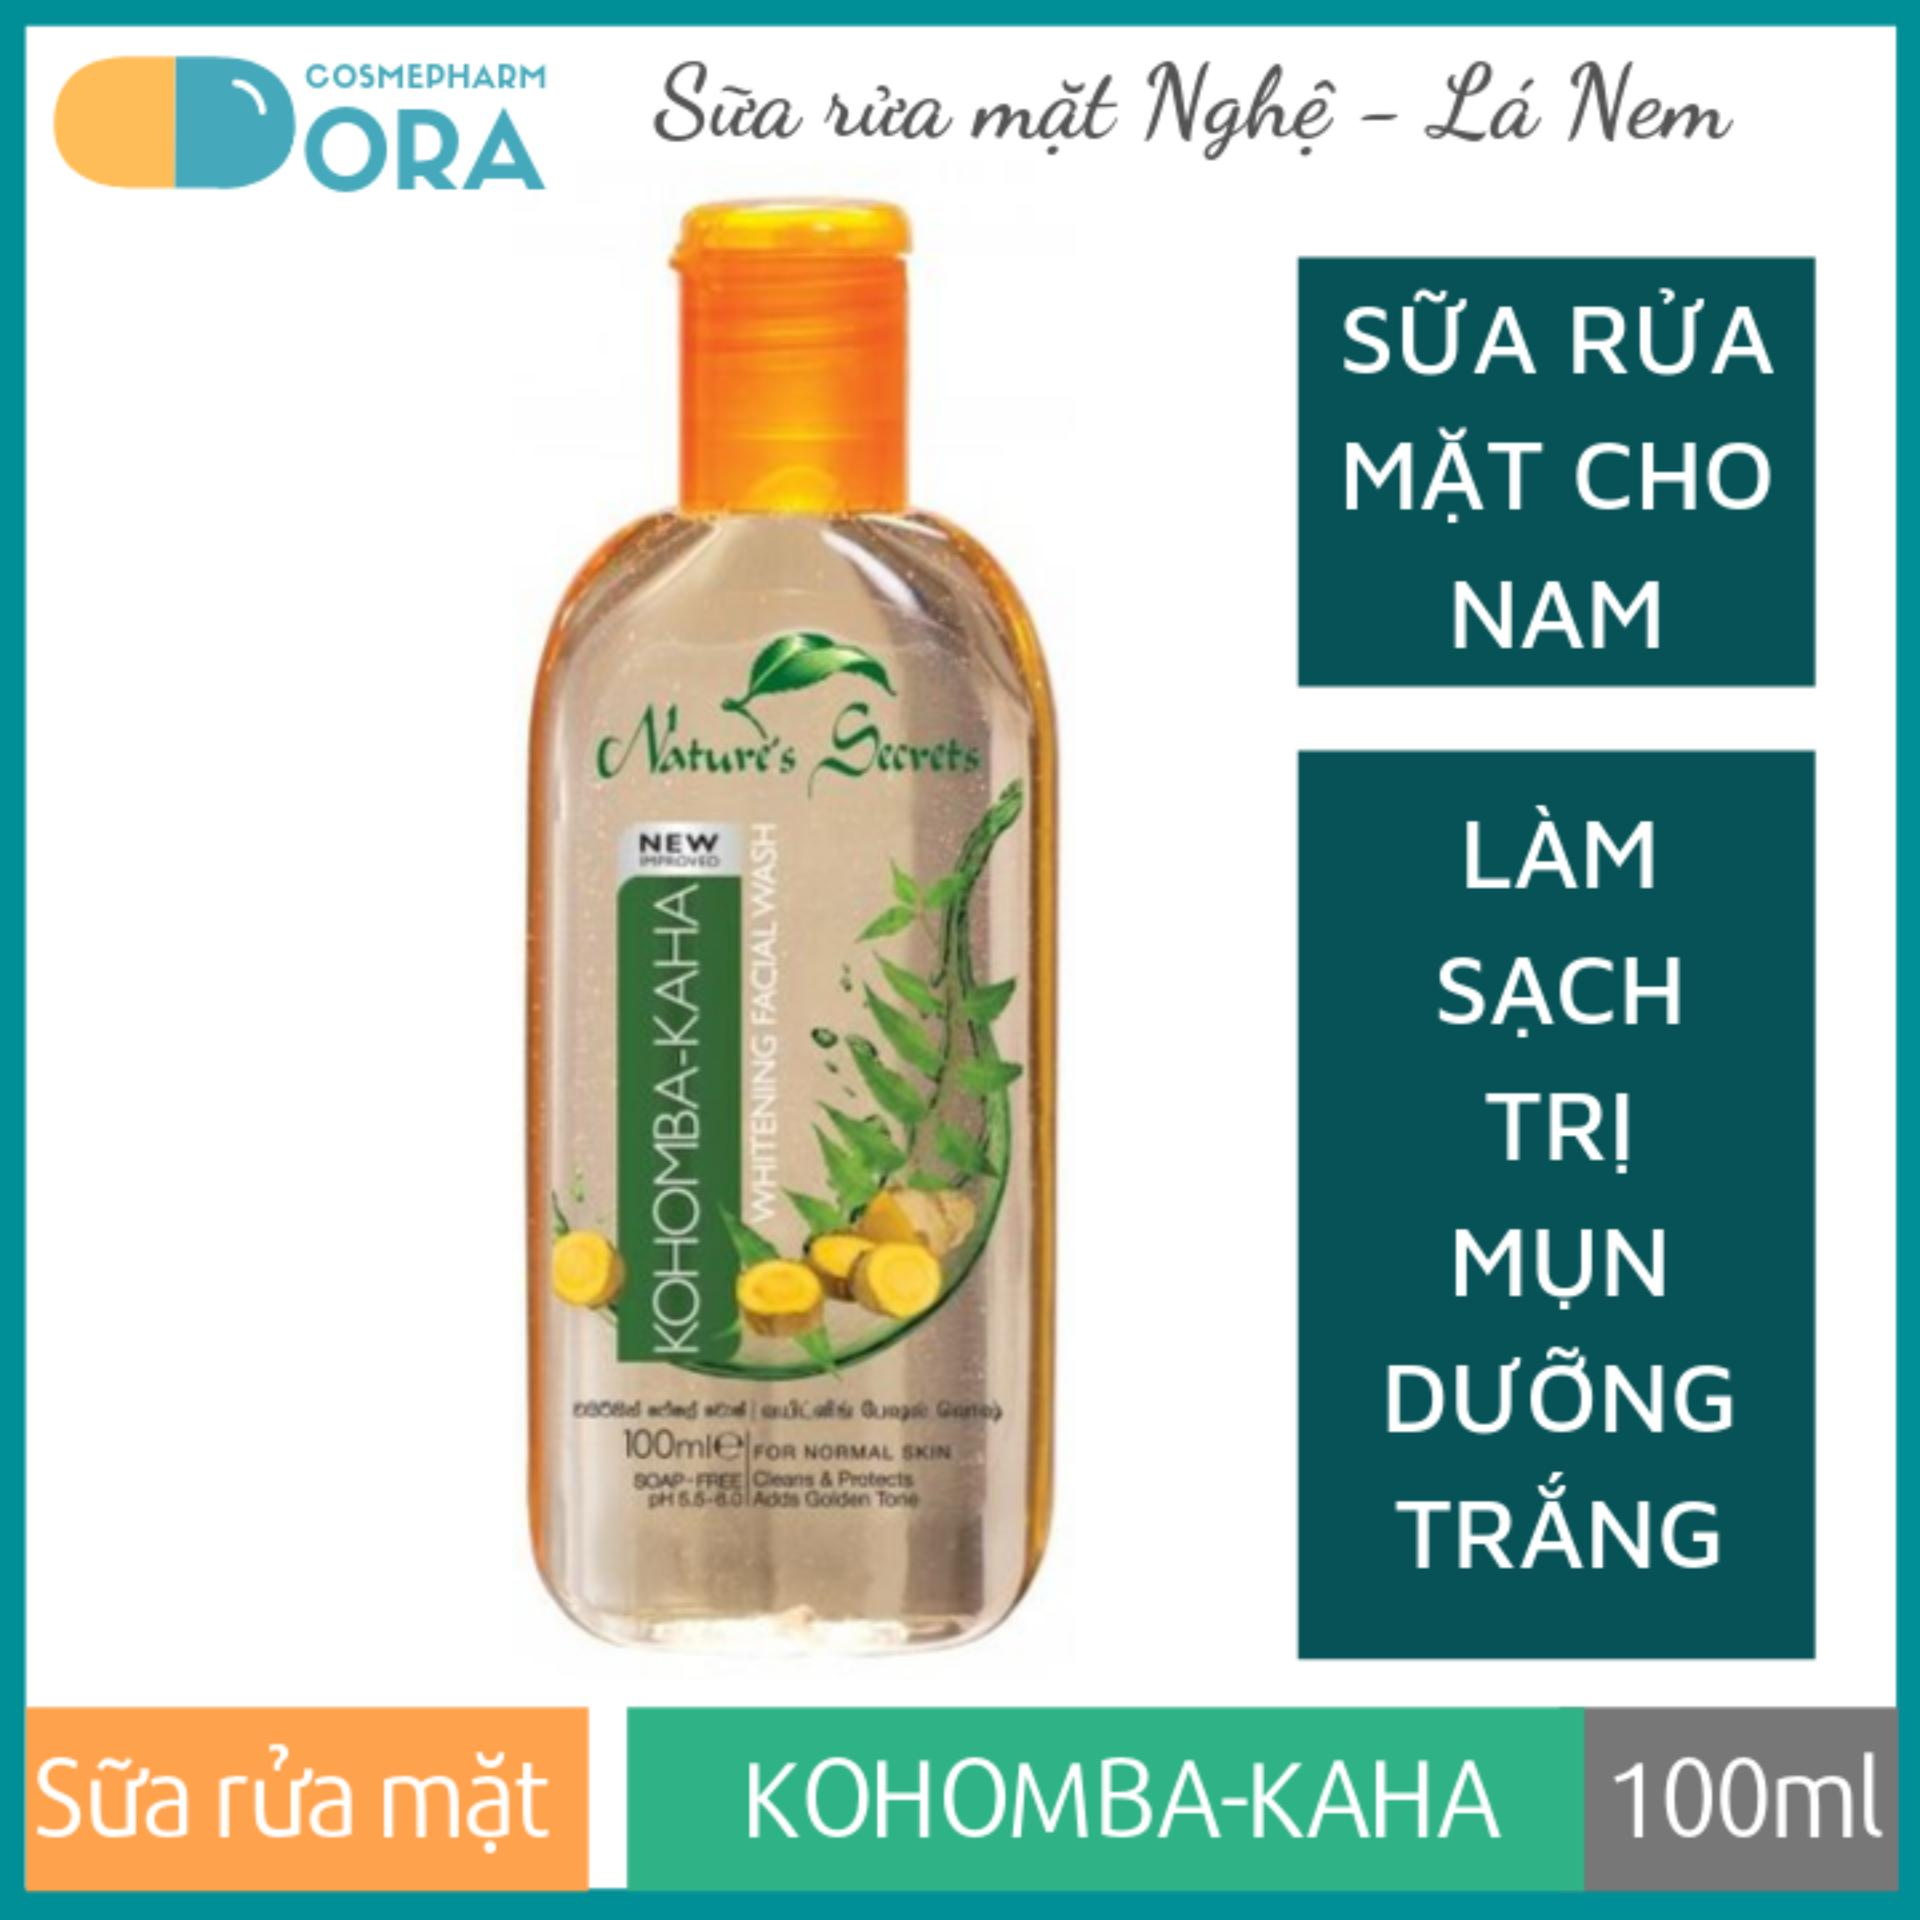 Sữa rửa mặt cho nam Kohomba - Kaha Extract Facial Cleansing Gel 100ml tốt nhất